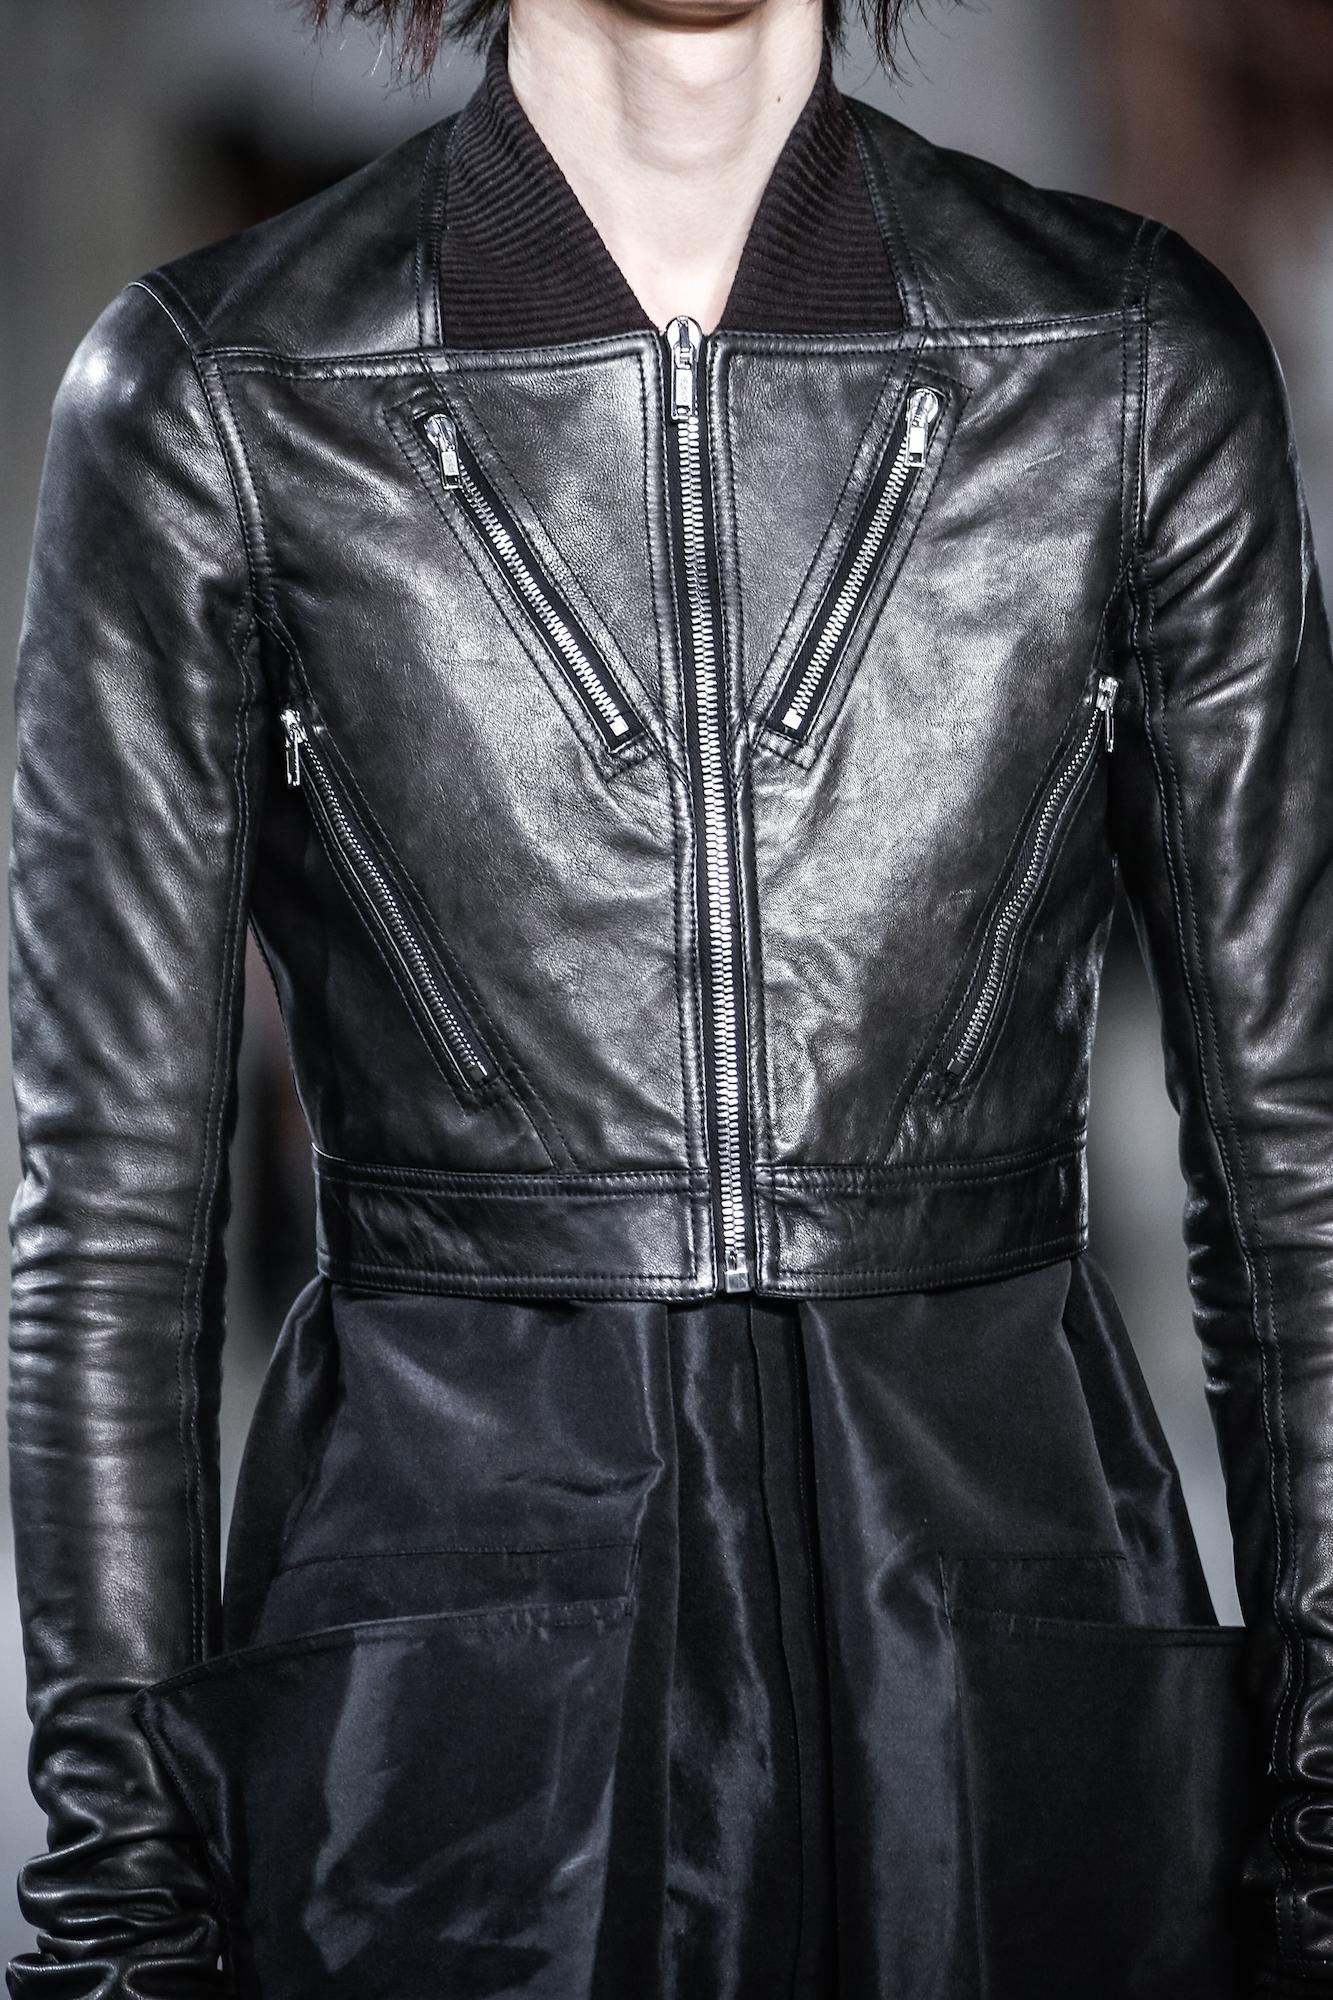 Original 26 jacket